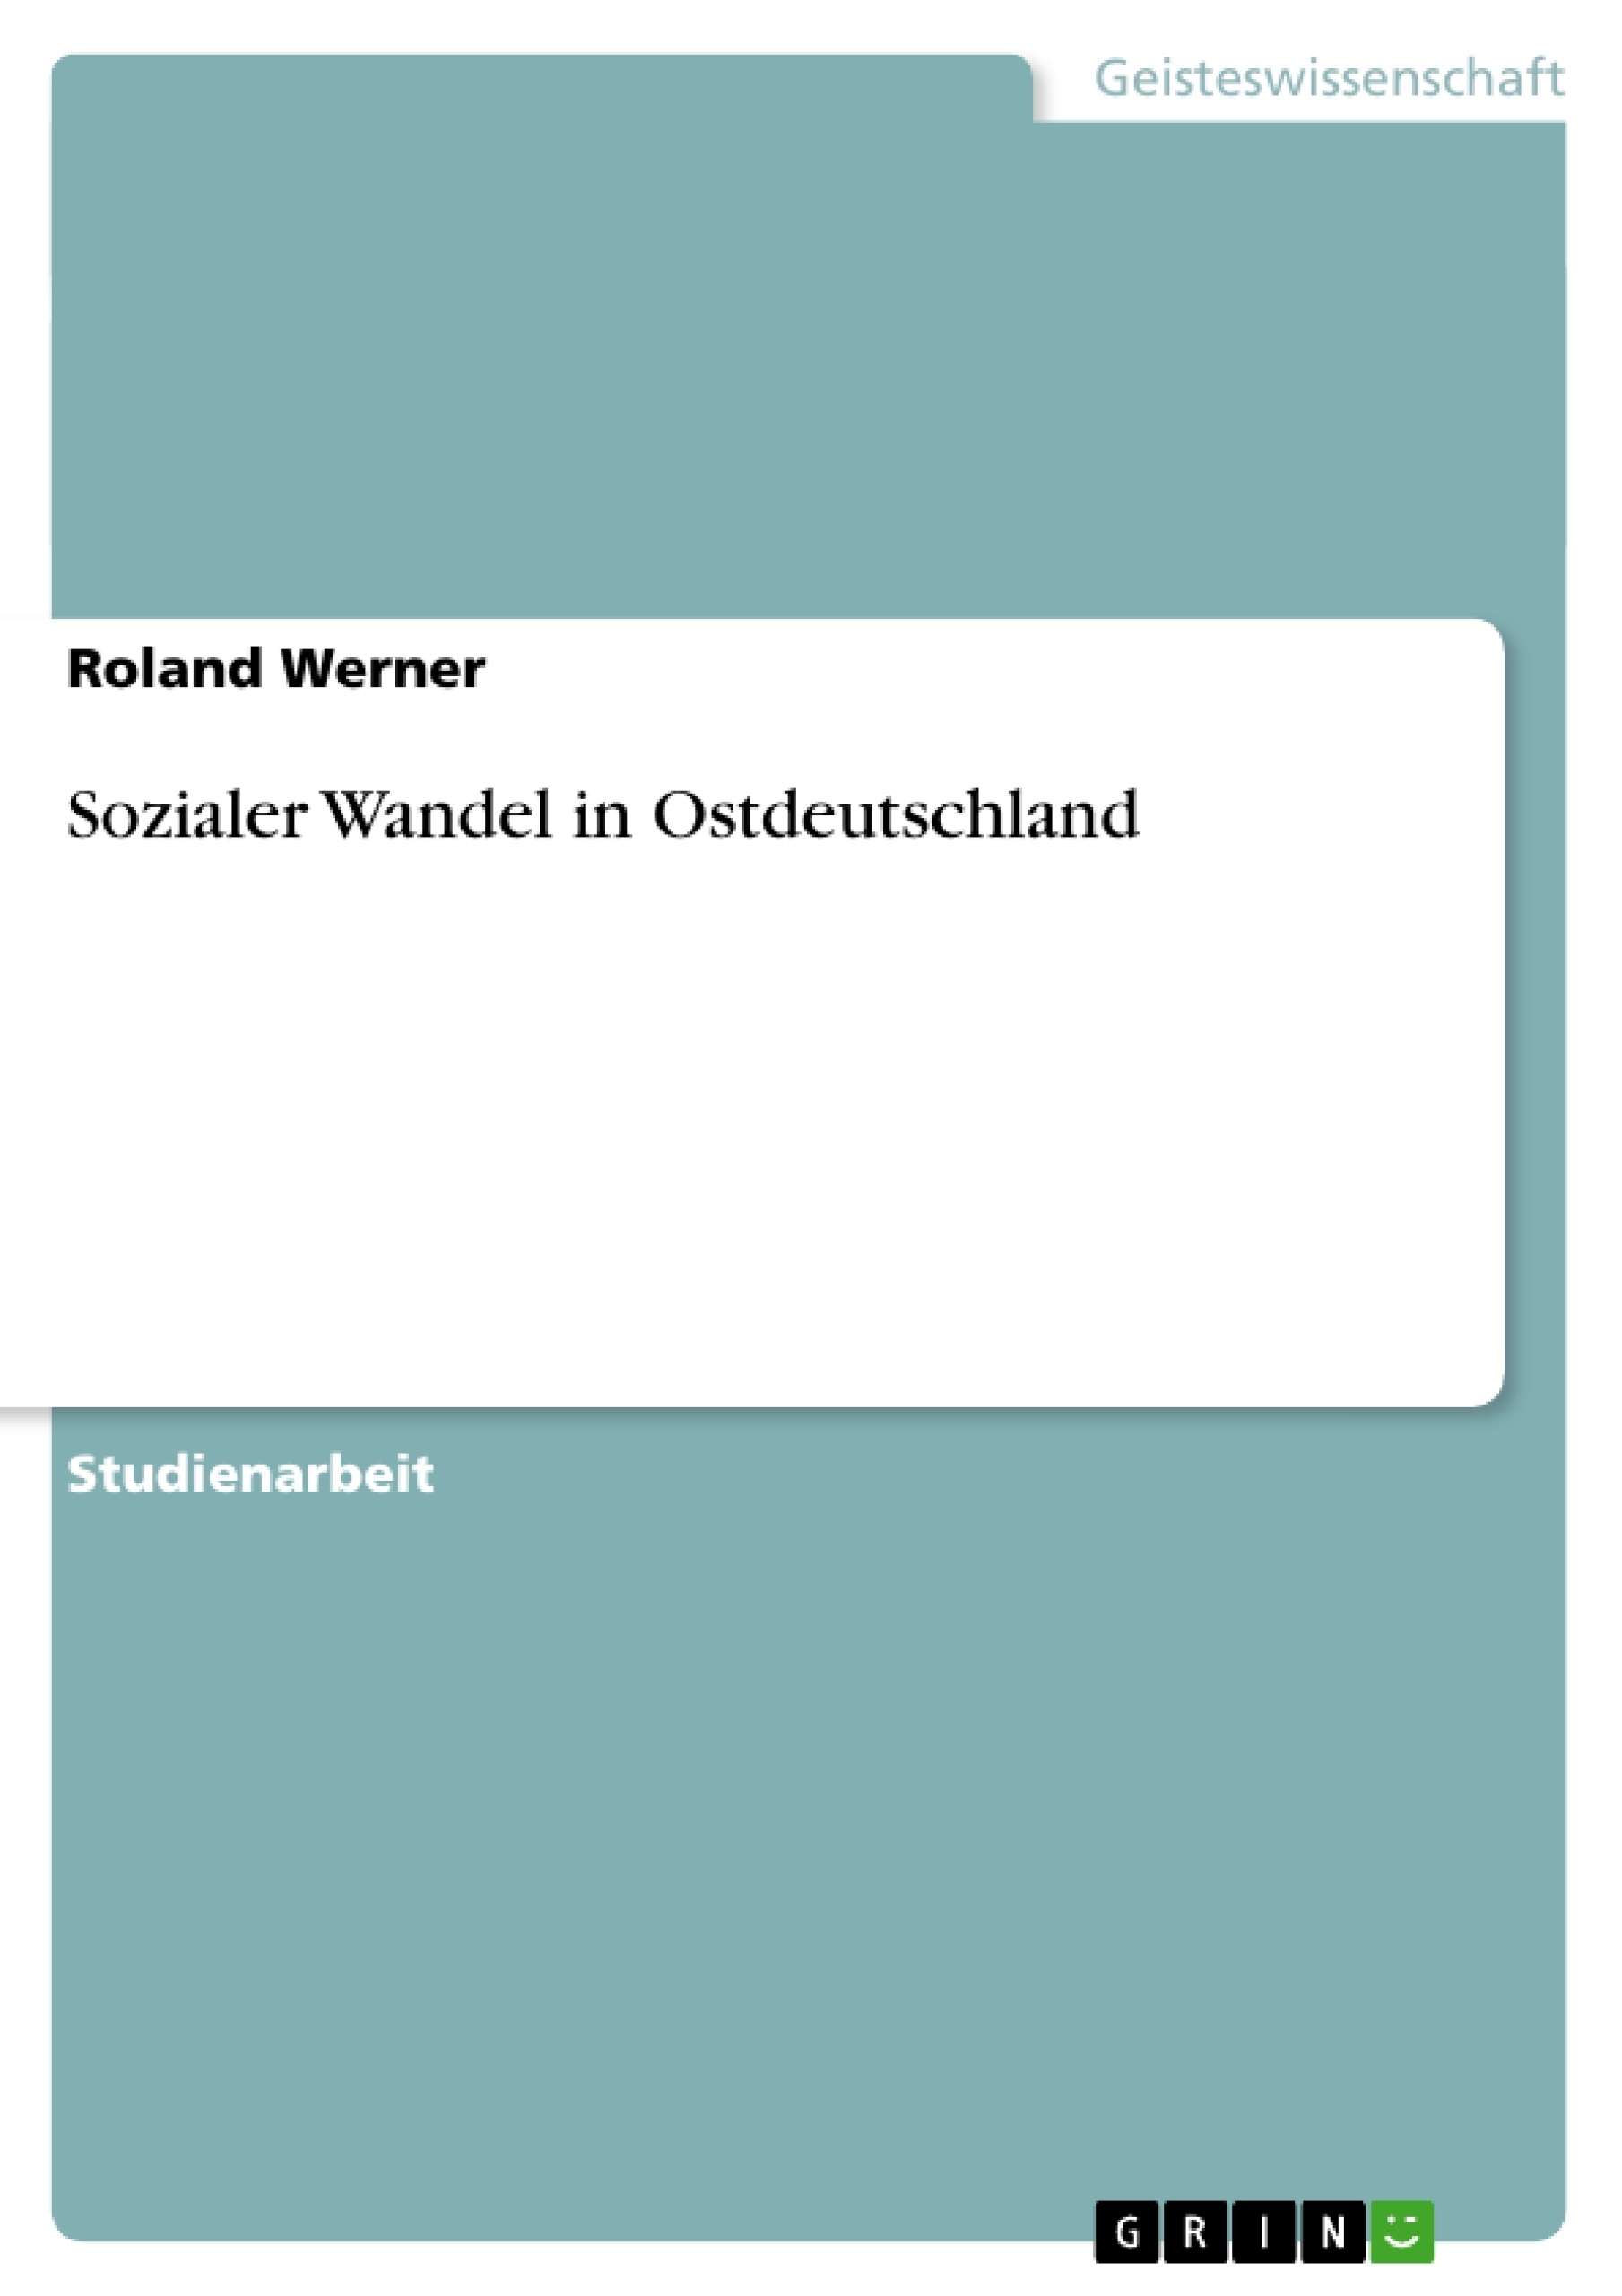 Titel: Sozialer Wandel in Ostdeutschland